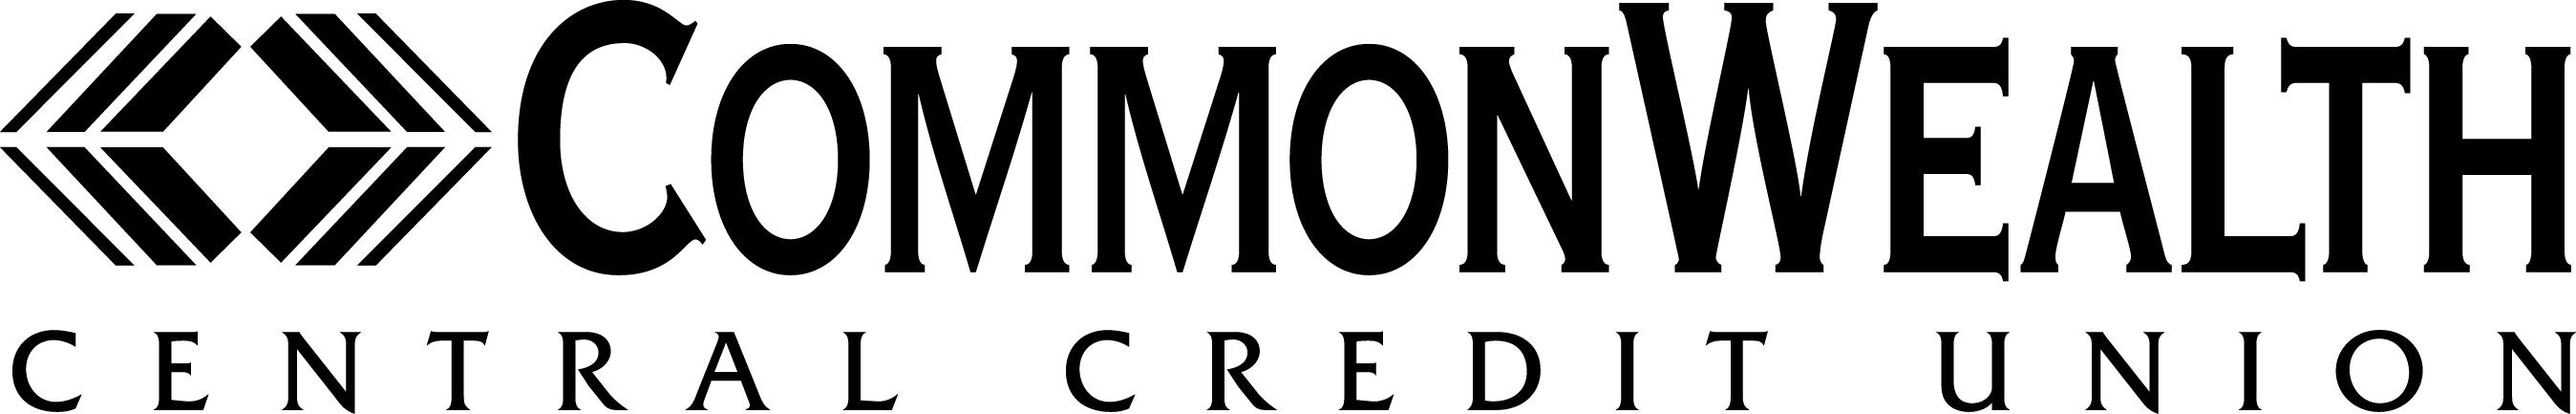 Common Wealth Central Credit Union